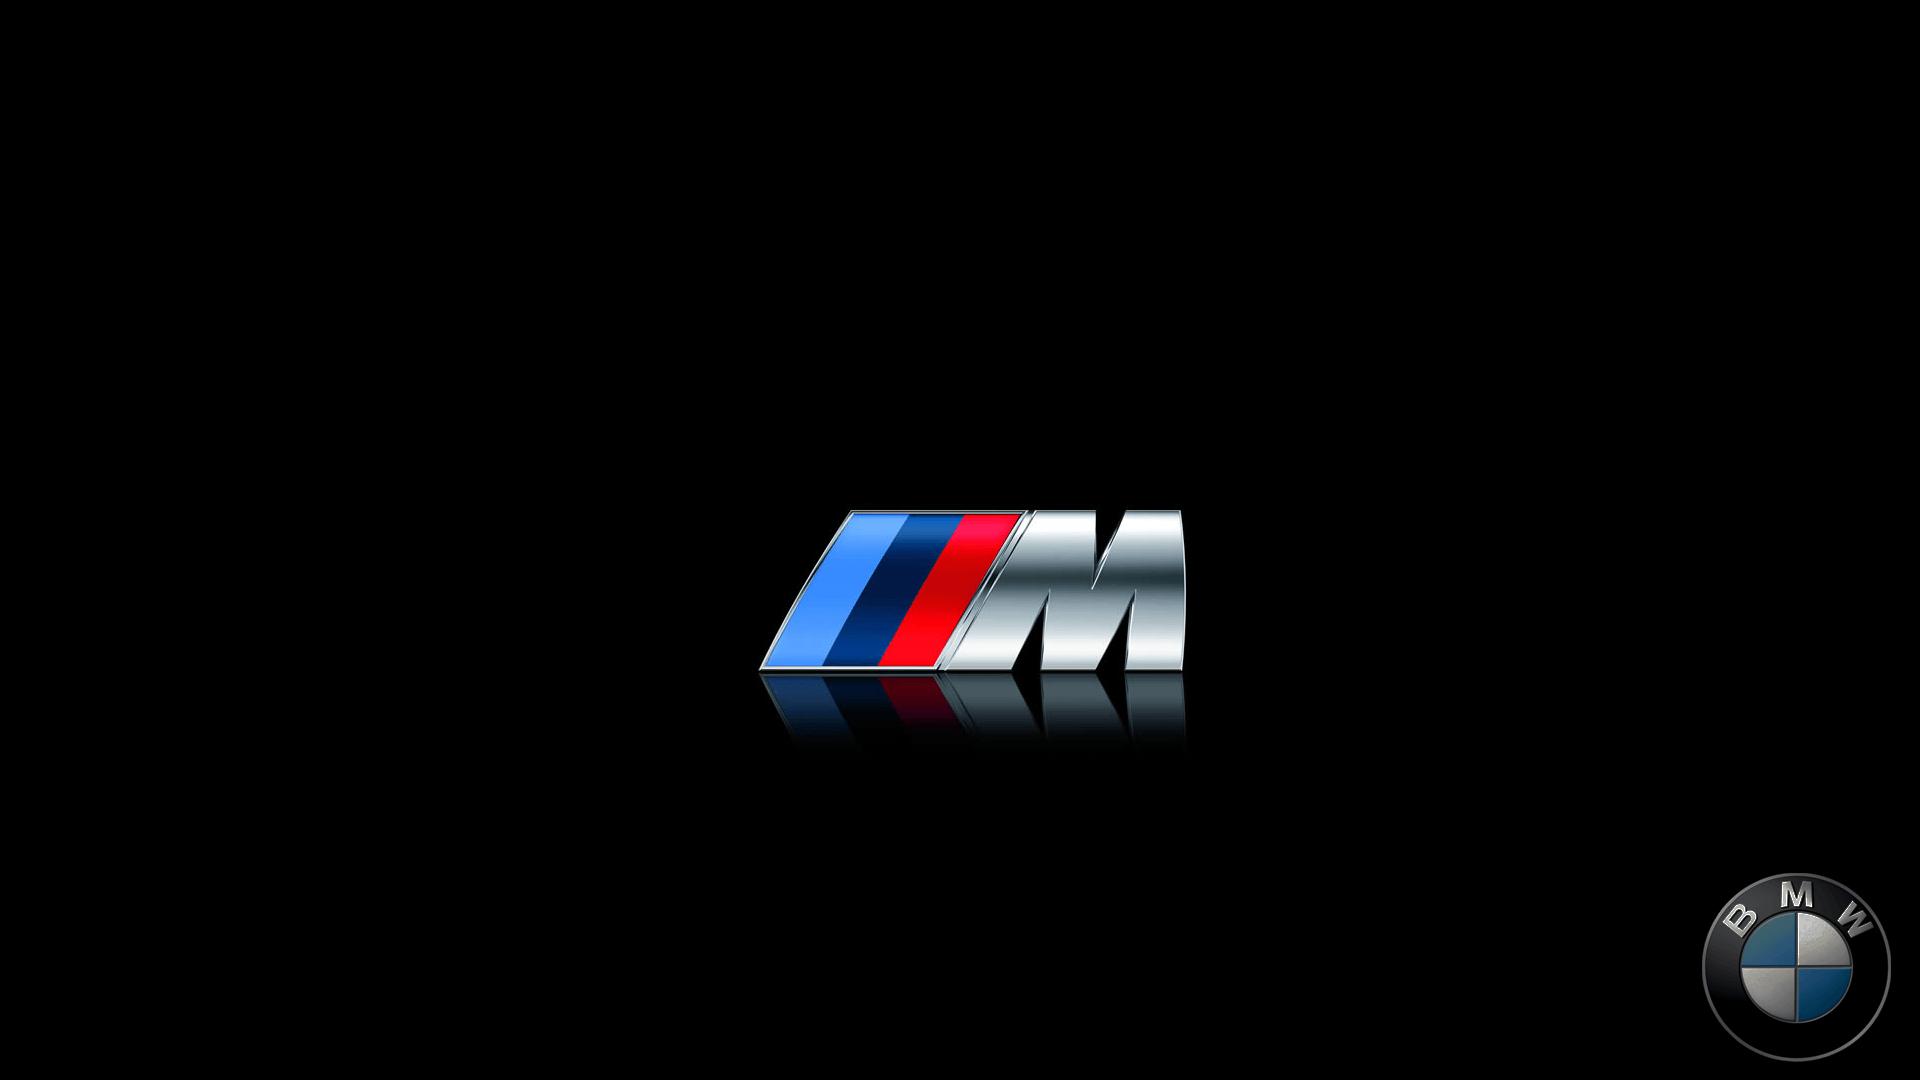 bmw m logo wallpapers